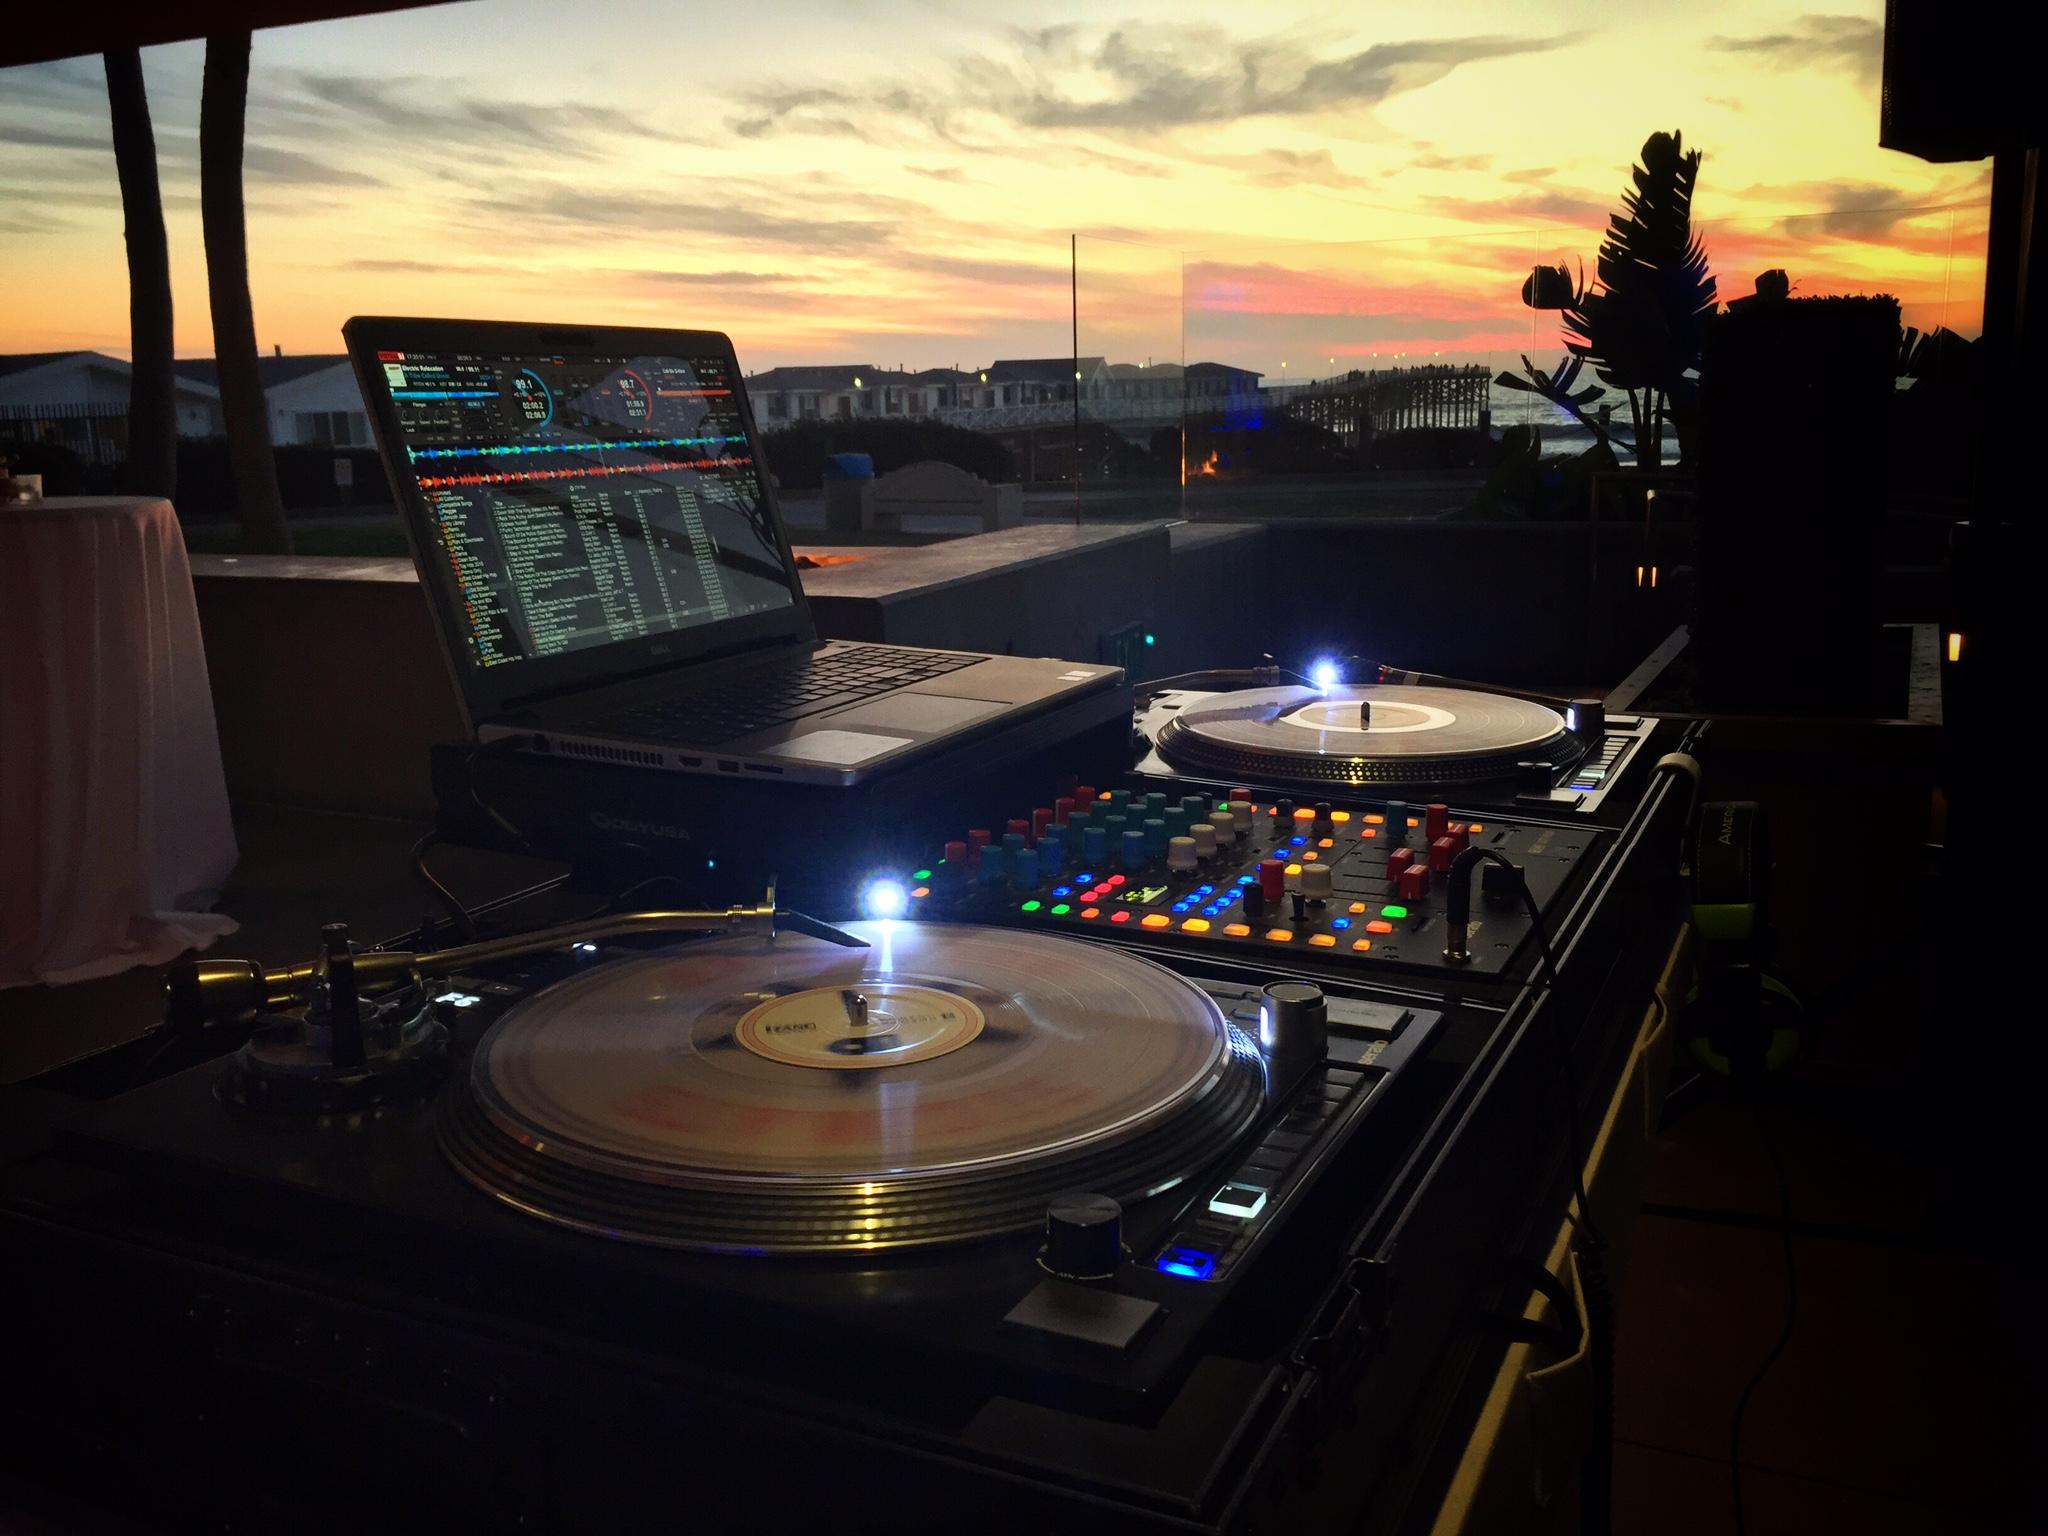 DJ Justin Kanoya provided live DJ service for Proven Recruting's 2015 Holiday Party at JRDN Restaurant.